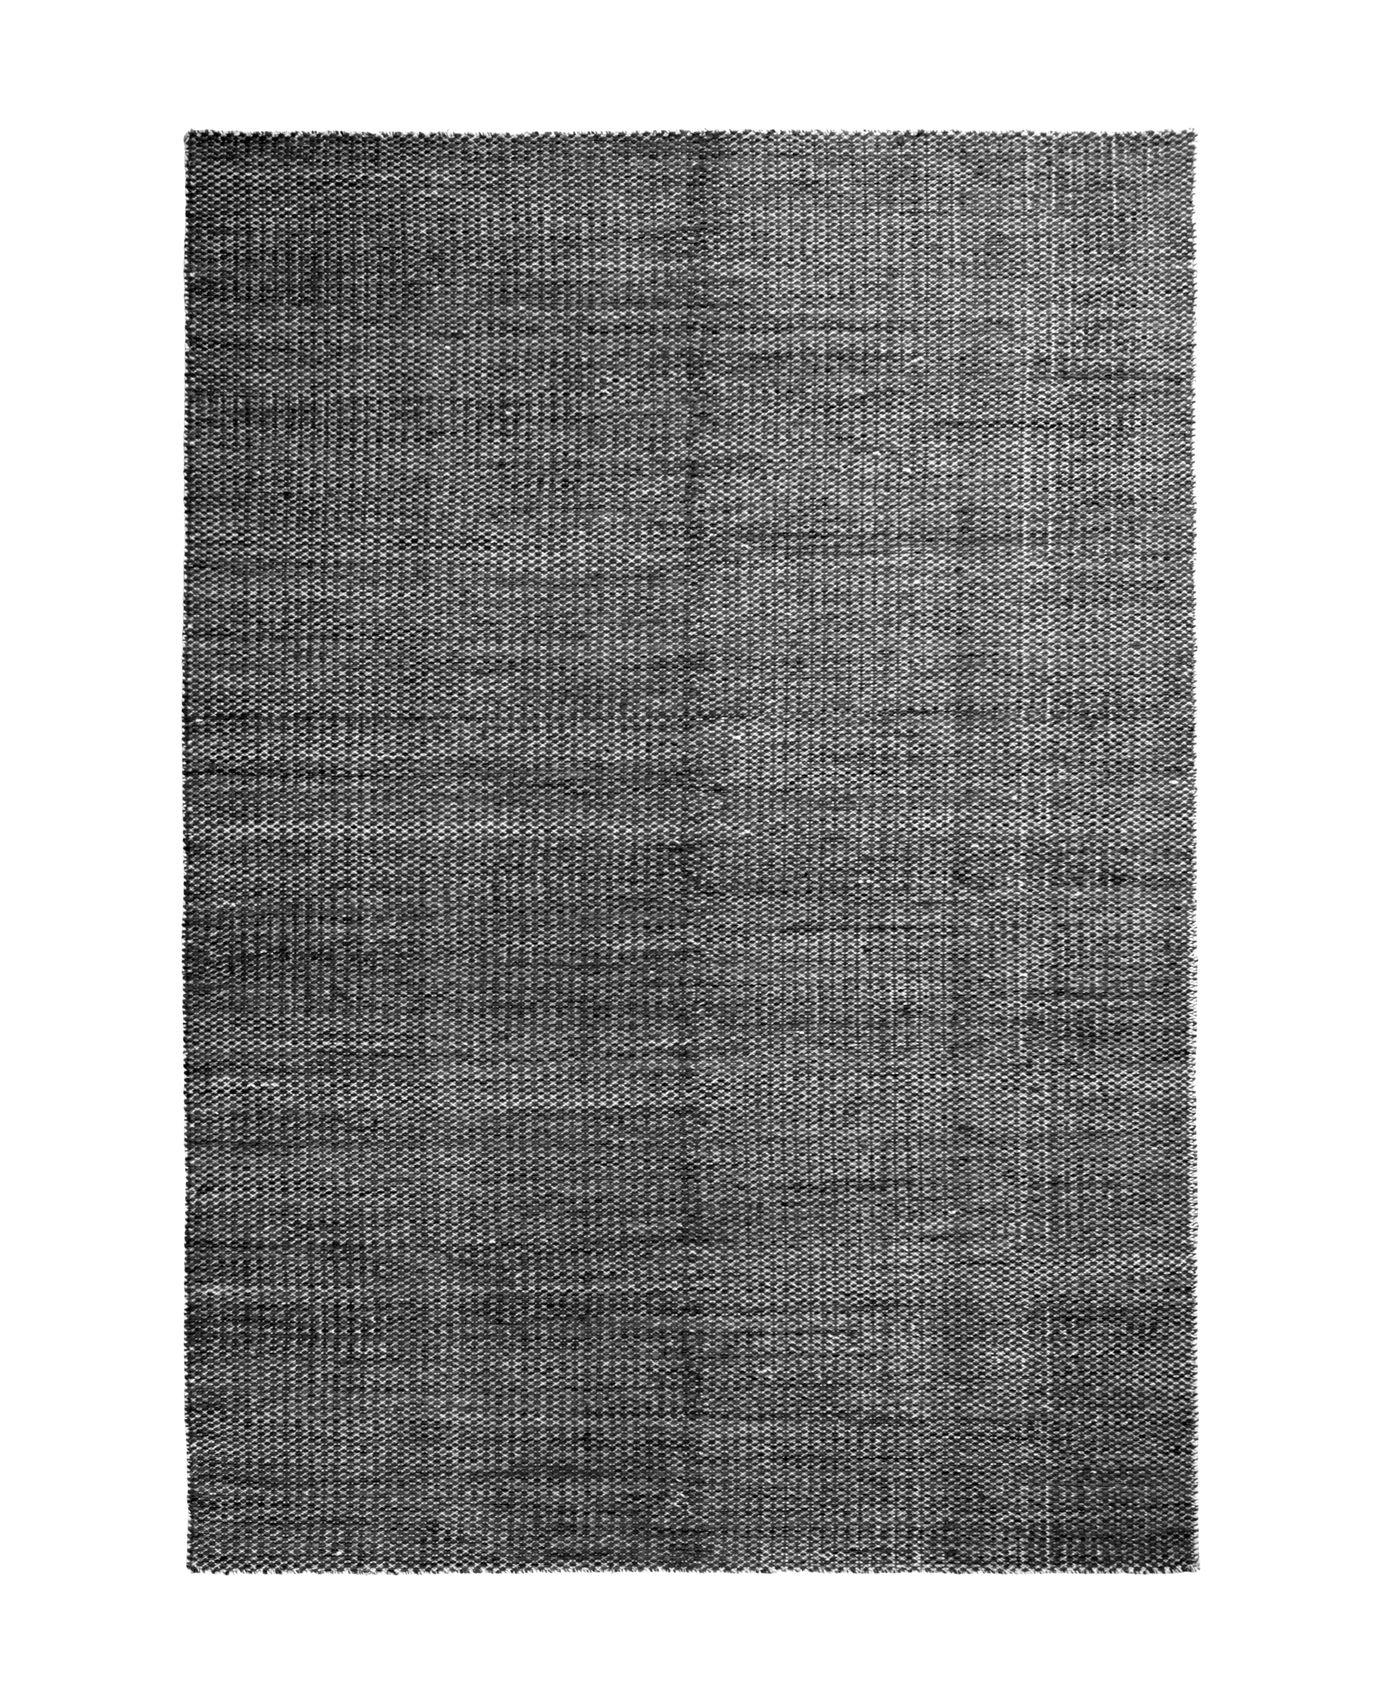 Interni - Tappeti - Tappeto Moiré Kelim Medium - / 170 x 240 cm - Tessuto a mano di Hay - Nero - Lana